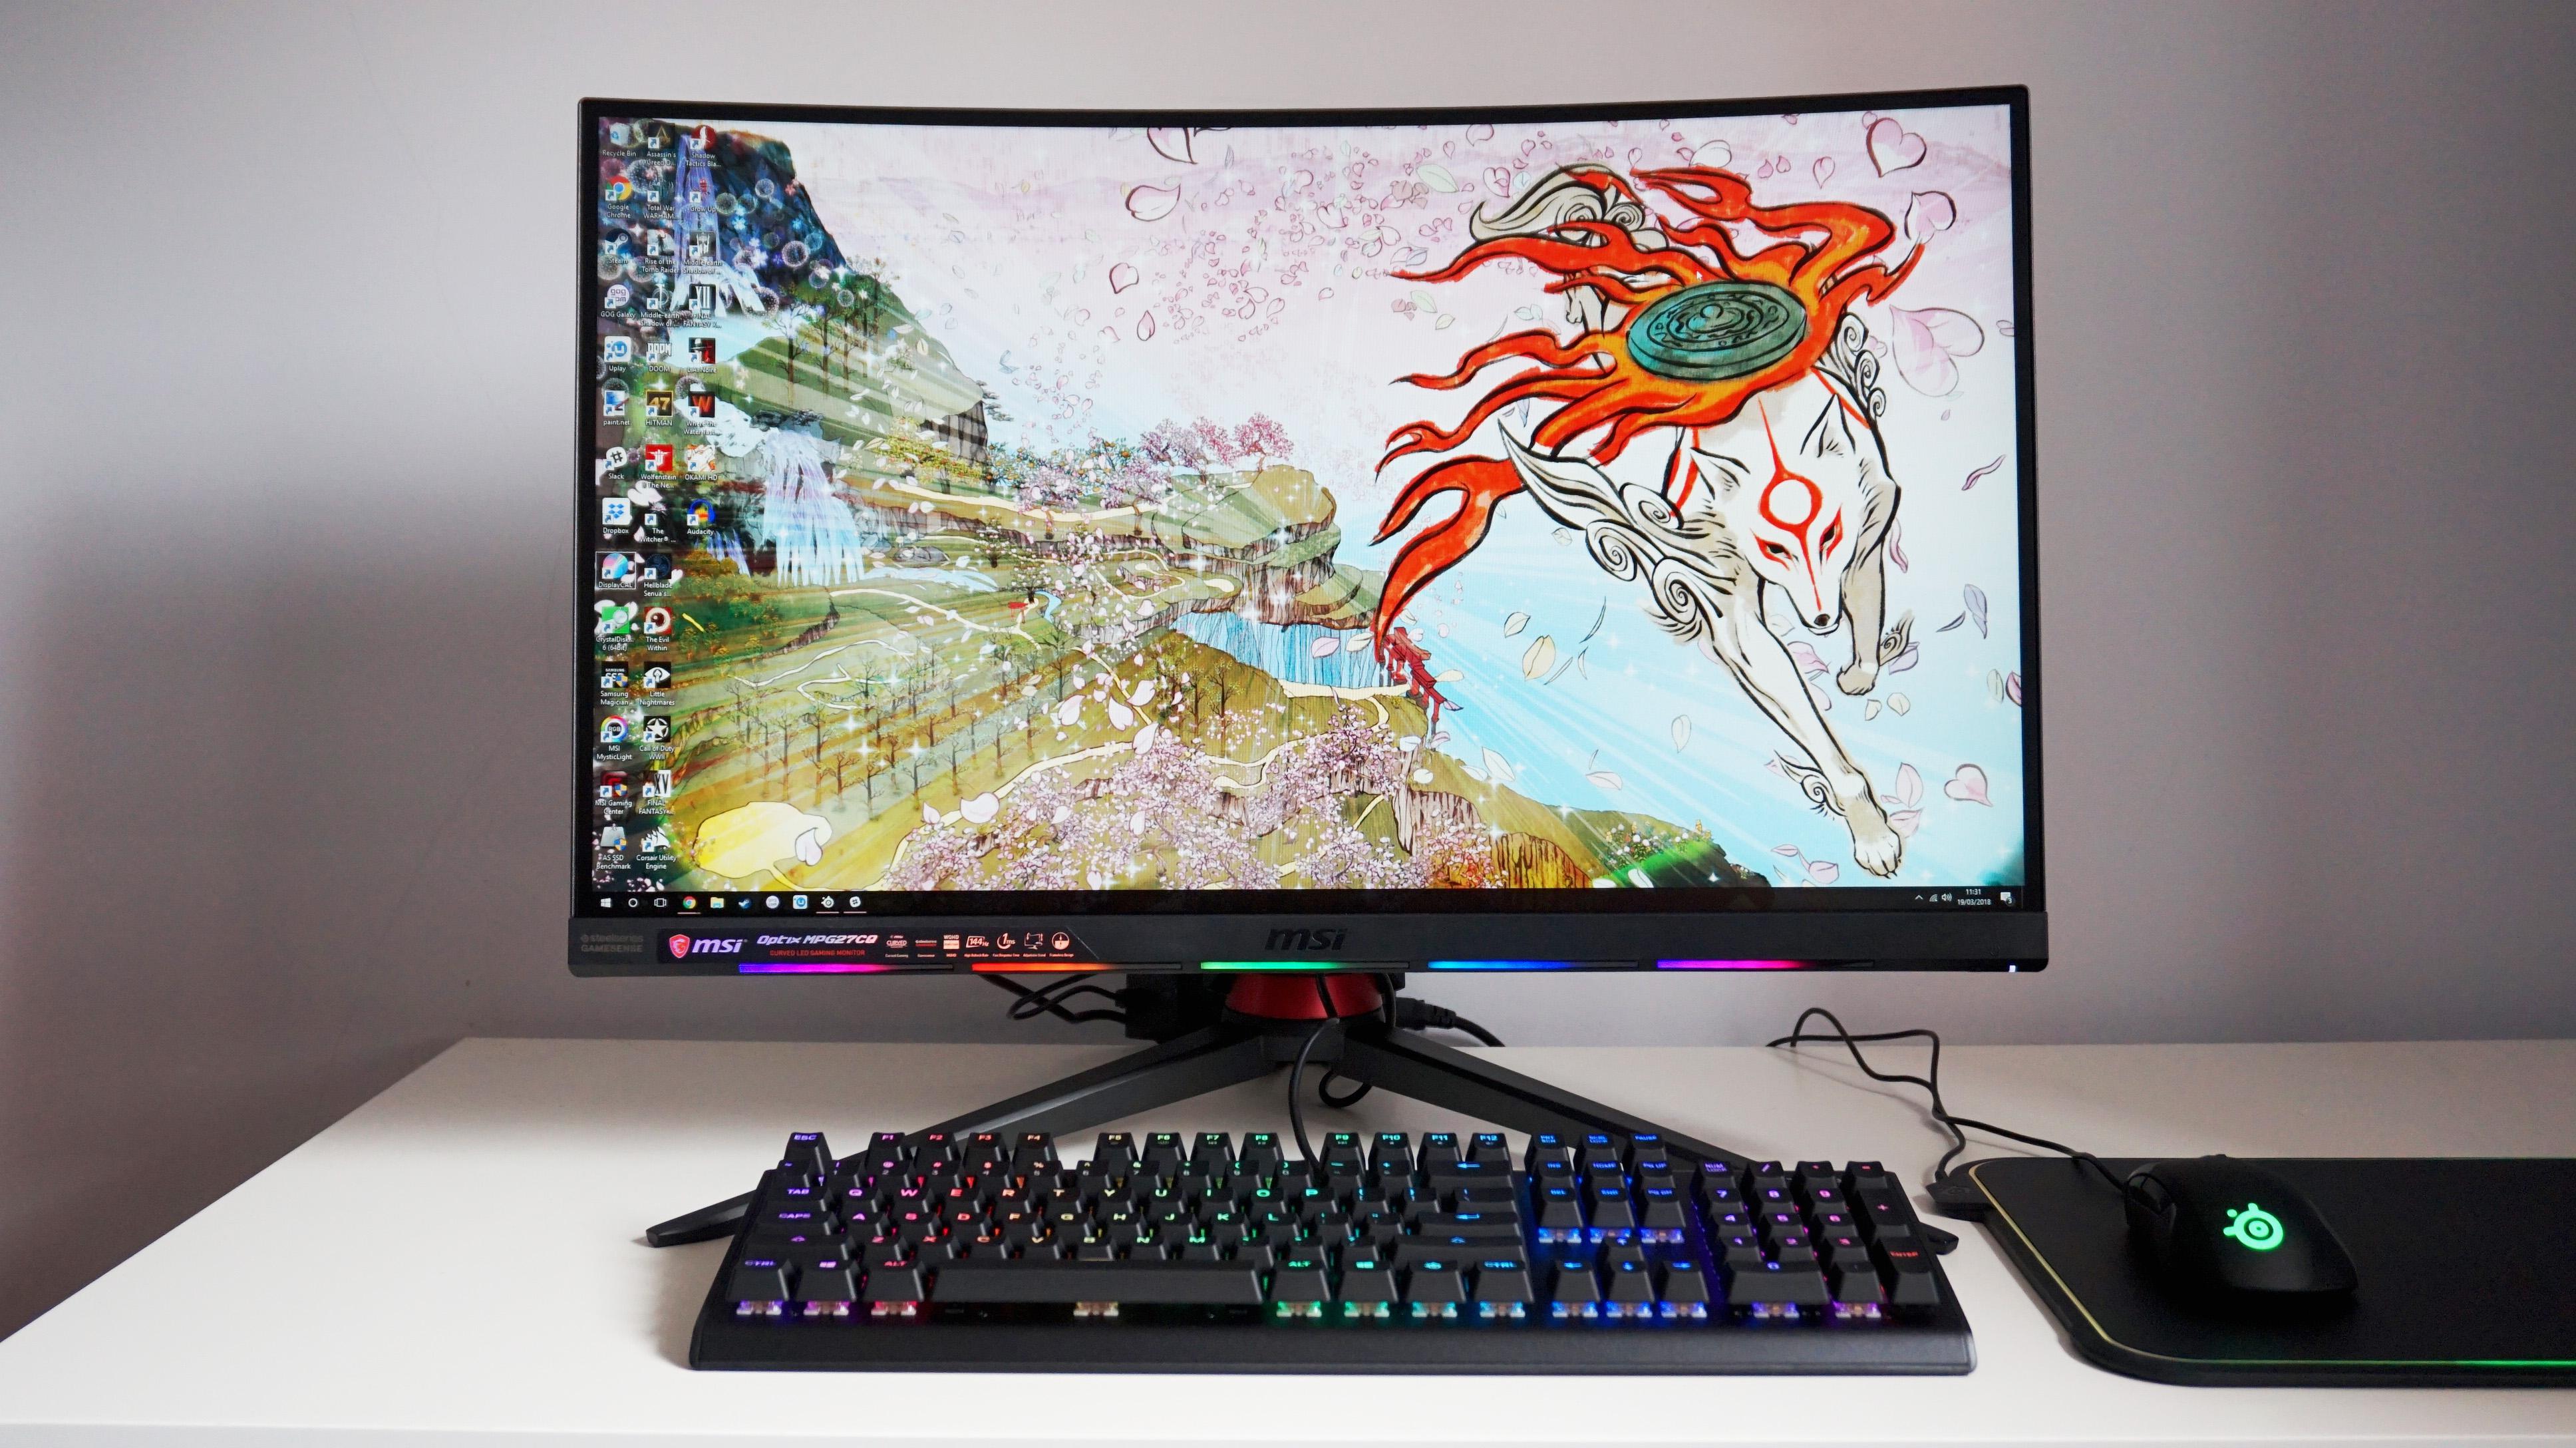 Best gaming monitor 2019: Top 1080p, 1440p and 4K HDR displays